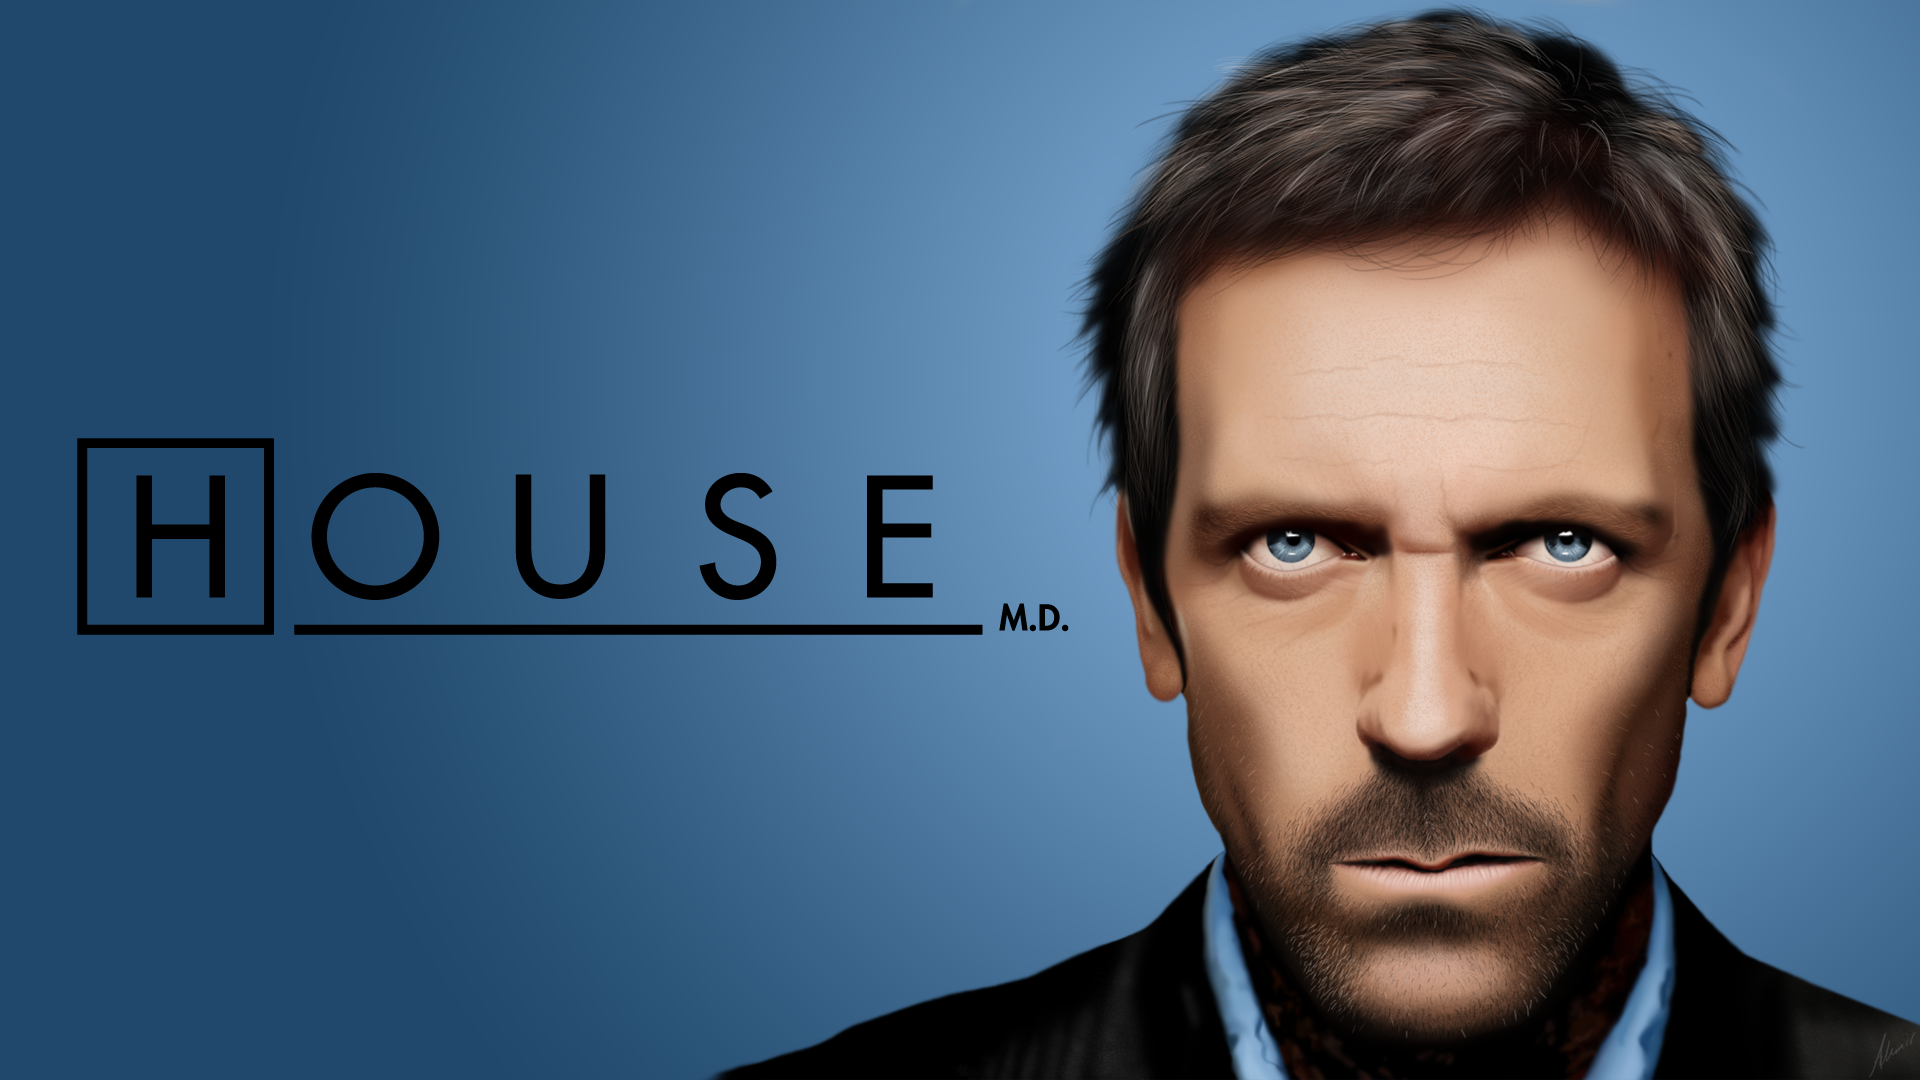 Dr. House - Wallpaper version by berserk2k on deviantART